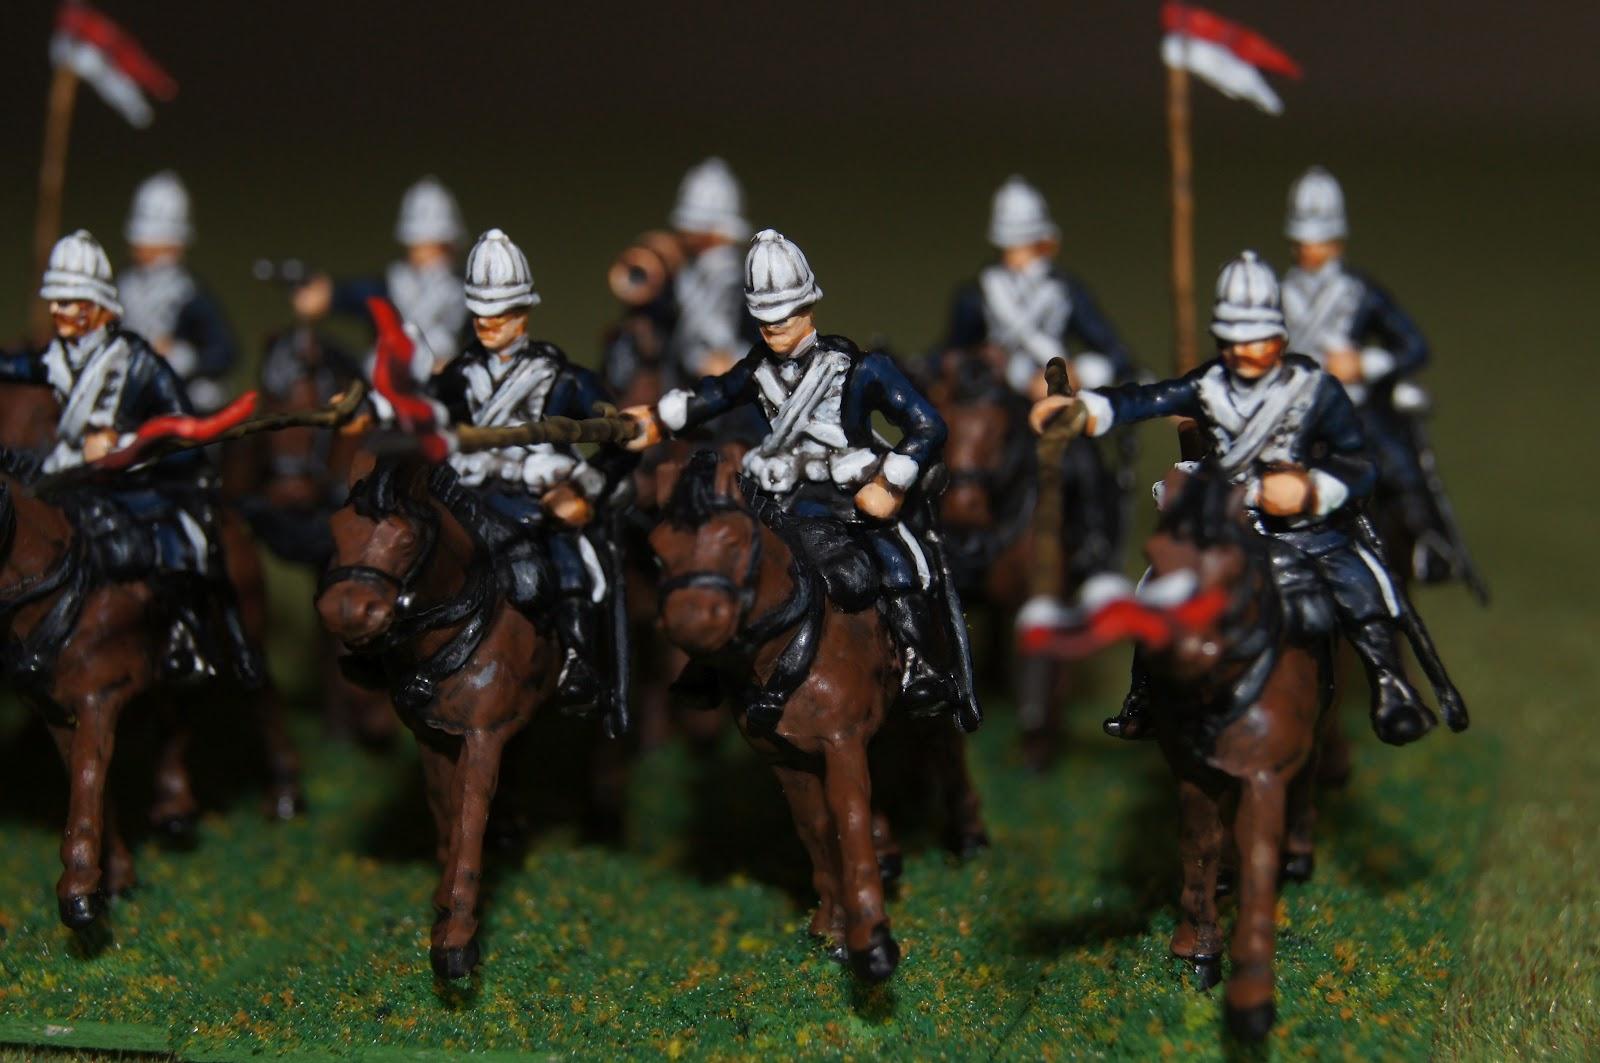 http://2.bp.blogspot.com/-Cy9f0XsTvrM/T-Q5DJyYdSI/AAAAAAAABnM/aOxQescGsok/s1600/hat+1+72+scale+17th+lancers+zulu+war+painted+(2).JPG